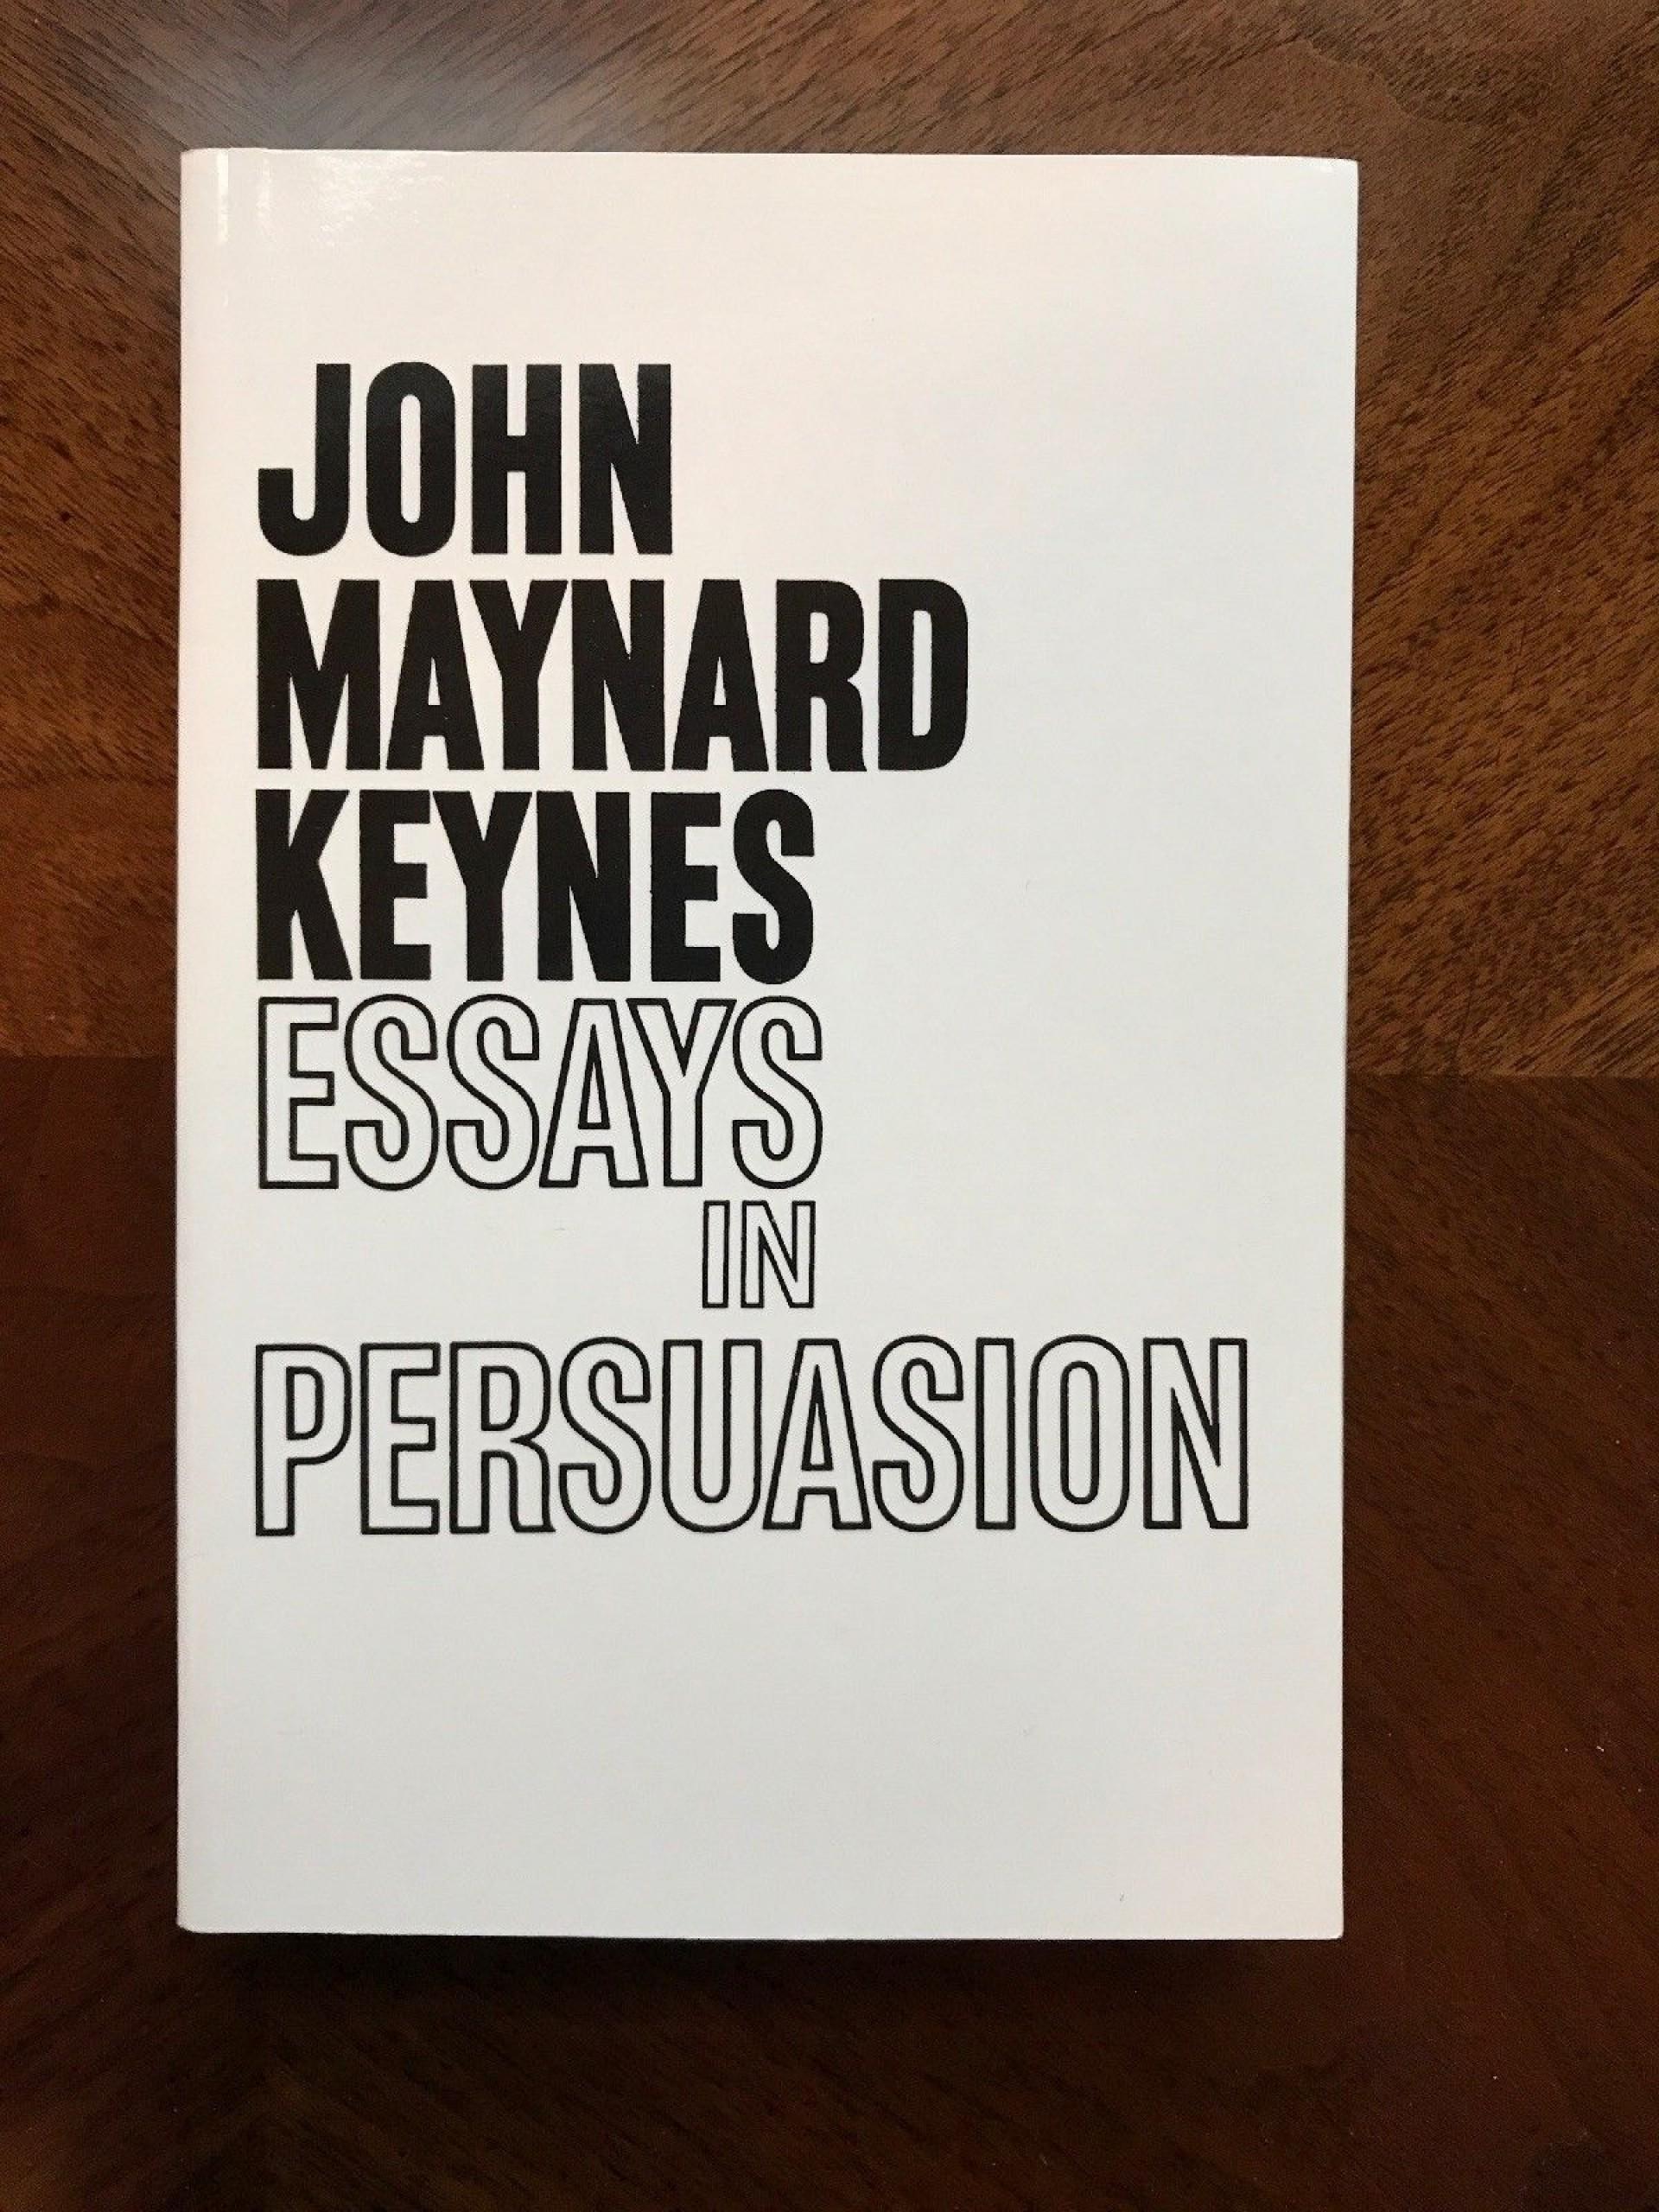 021 S L1600 Essay Example Essays In Remarkable Persuasion Audiobook Pdf John Maynard Keynes Summary 1920